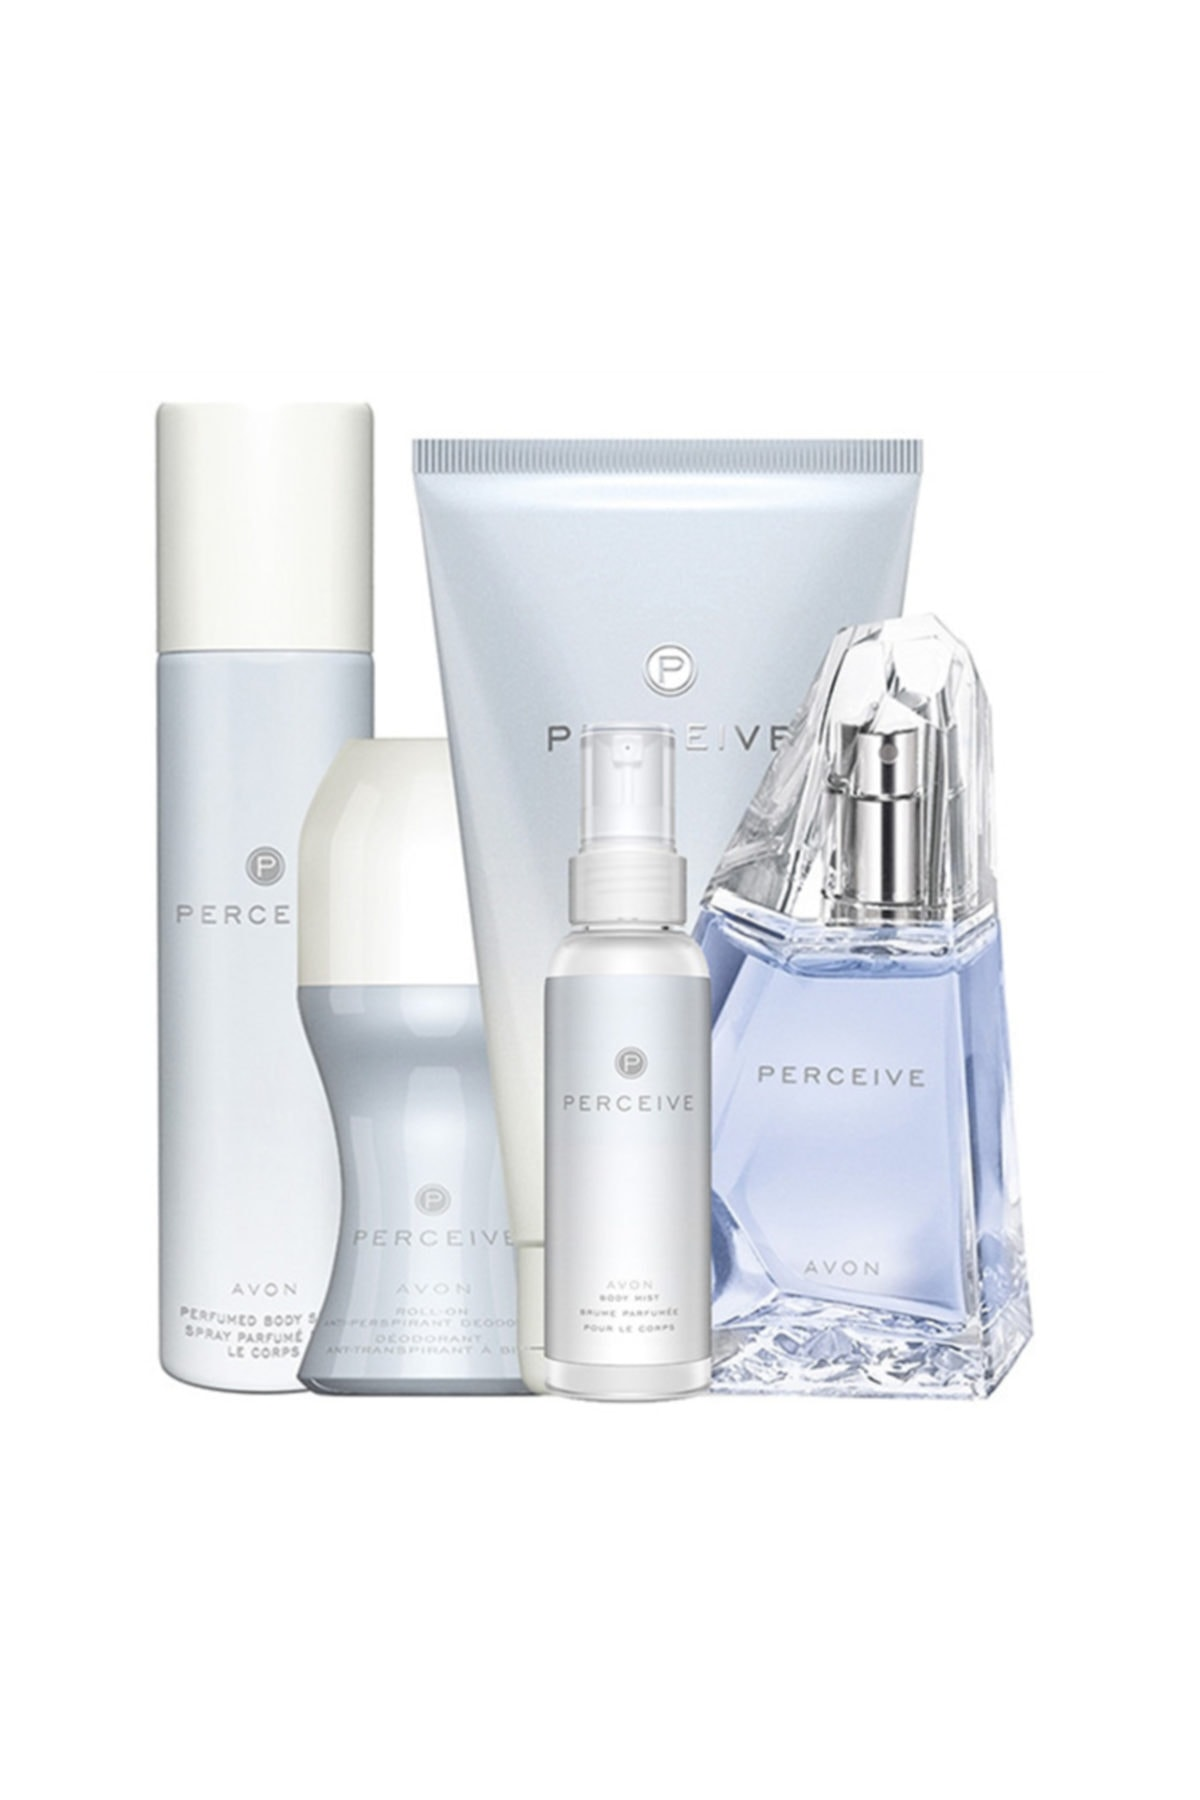 AVON Perceive Kadın Parfüm Losyon Rollon Deodorant Bodymist Set 1